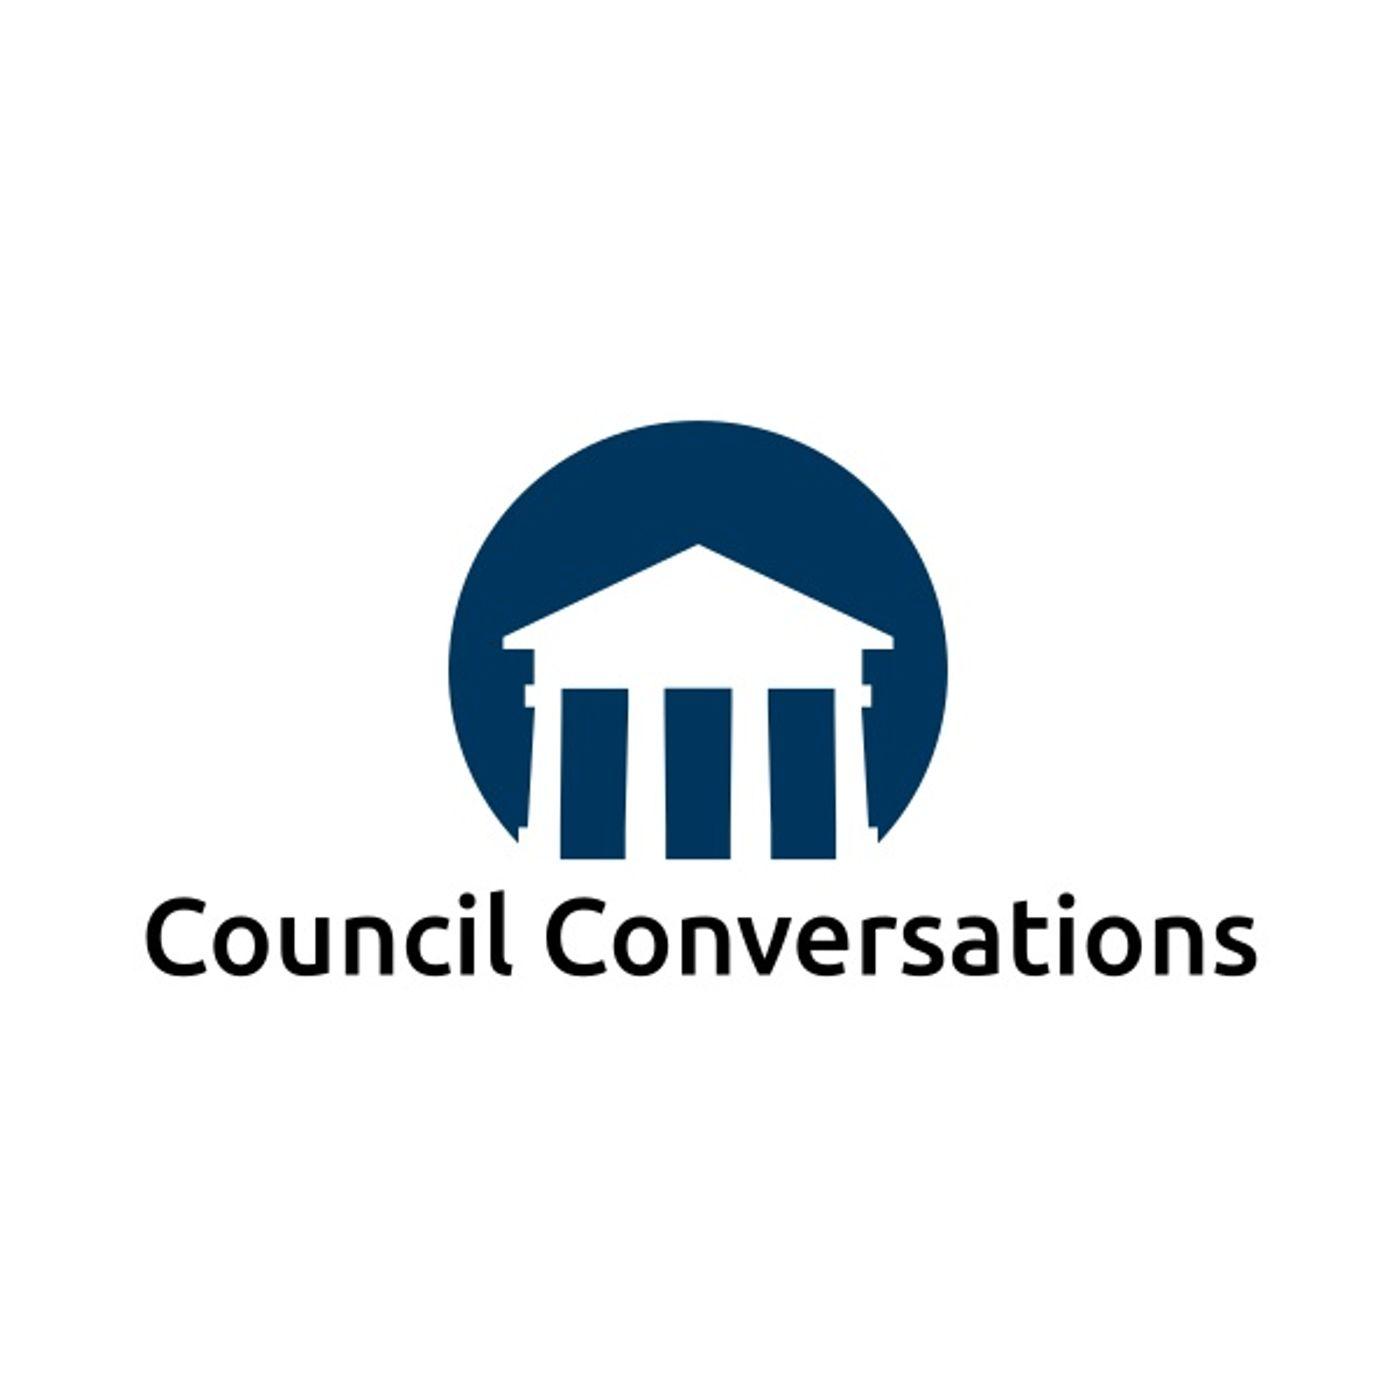 Council Conversations